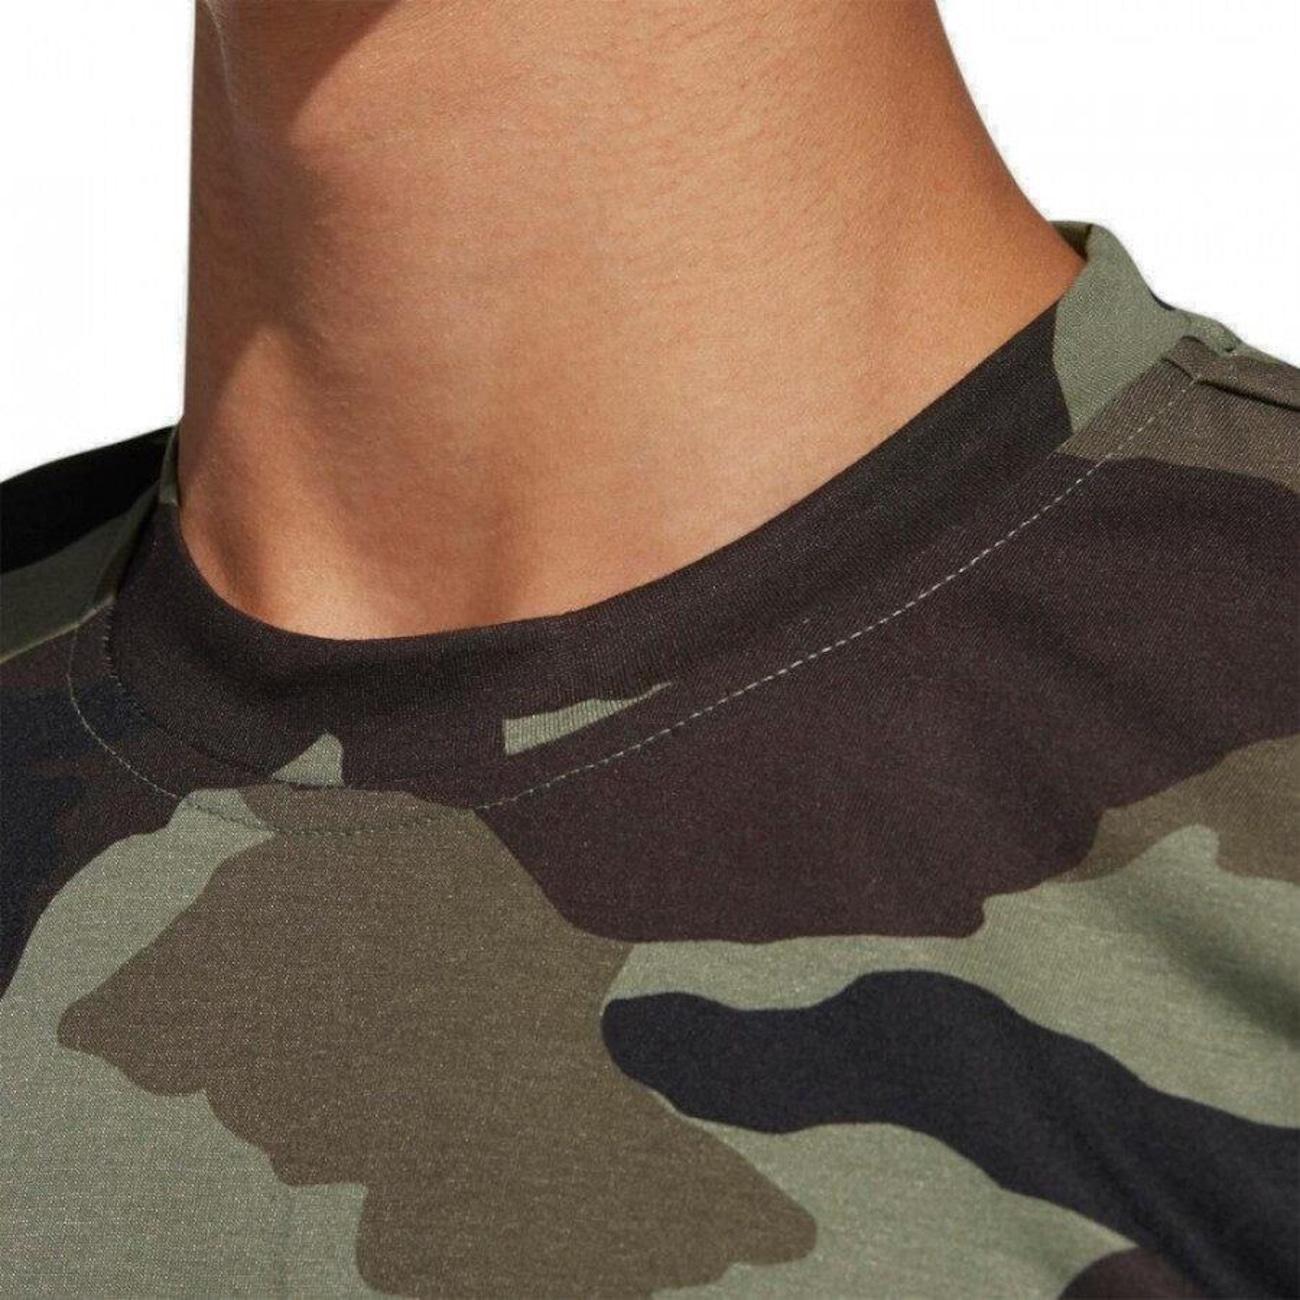 Parecer suficiente superficie  Camiseta adidas Malha Climb Camuflada Militar - Masculina - Centauro